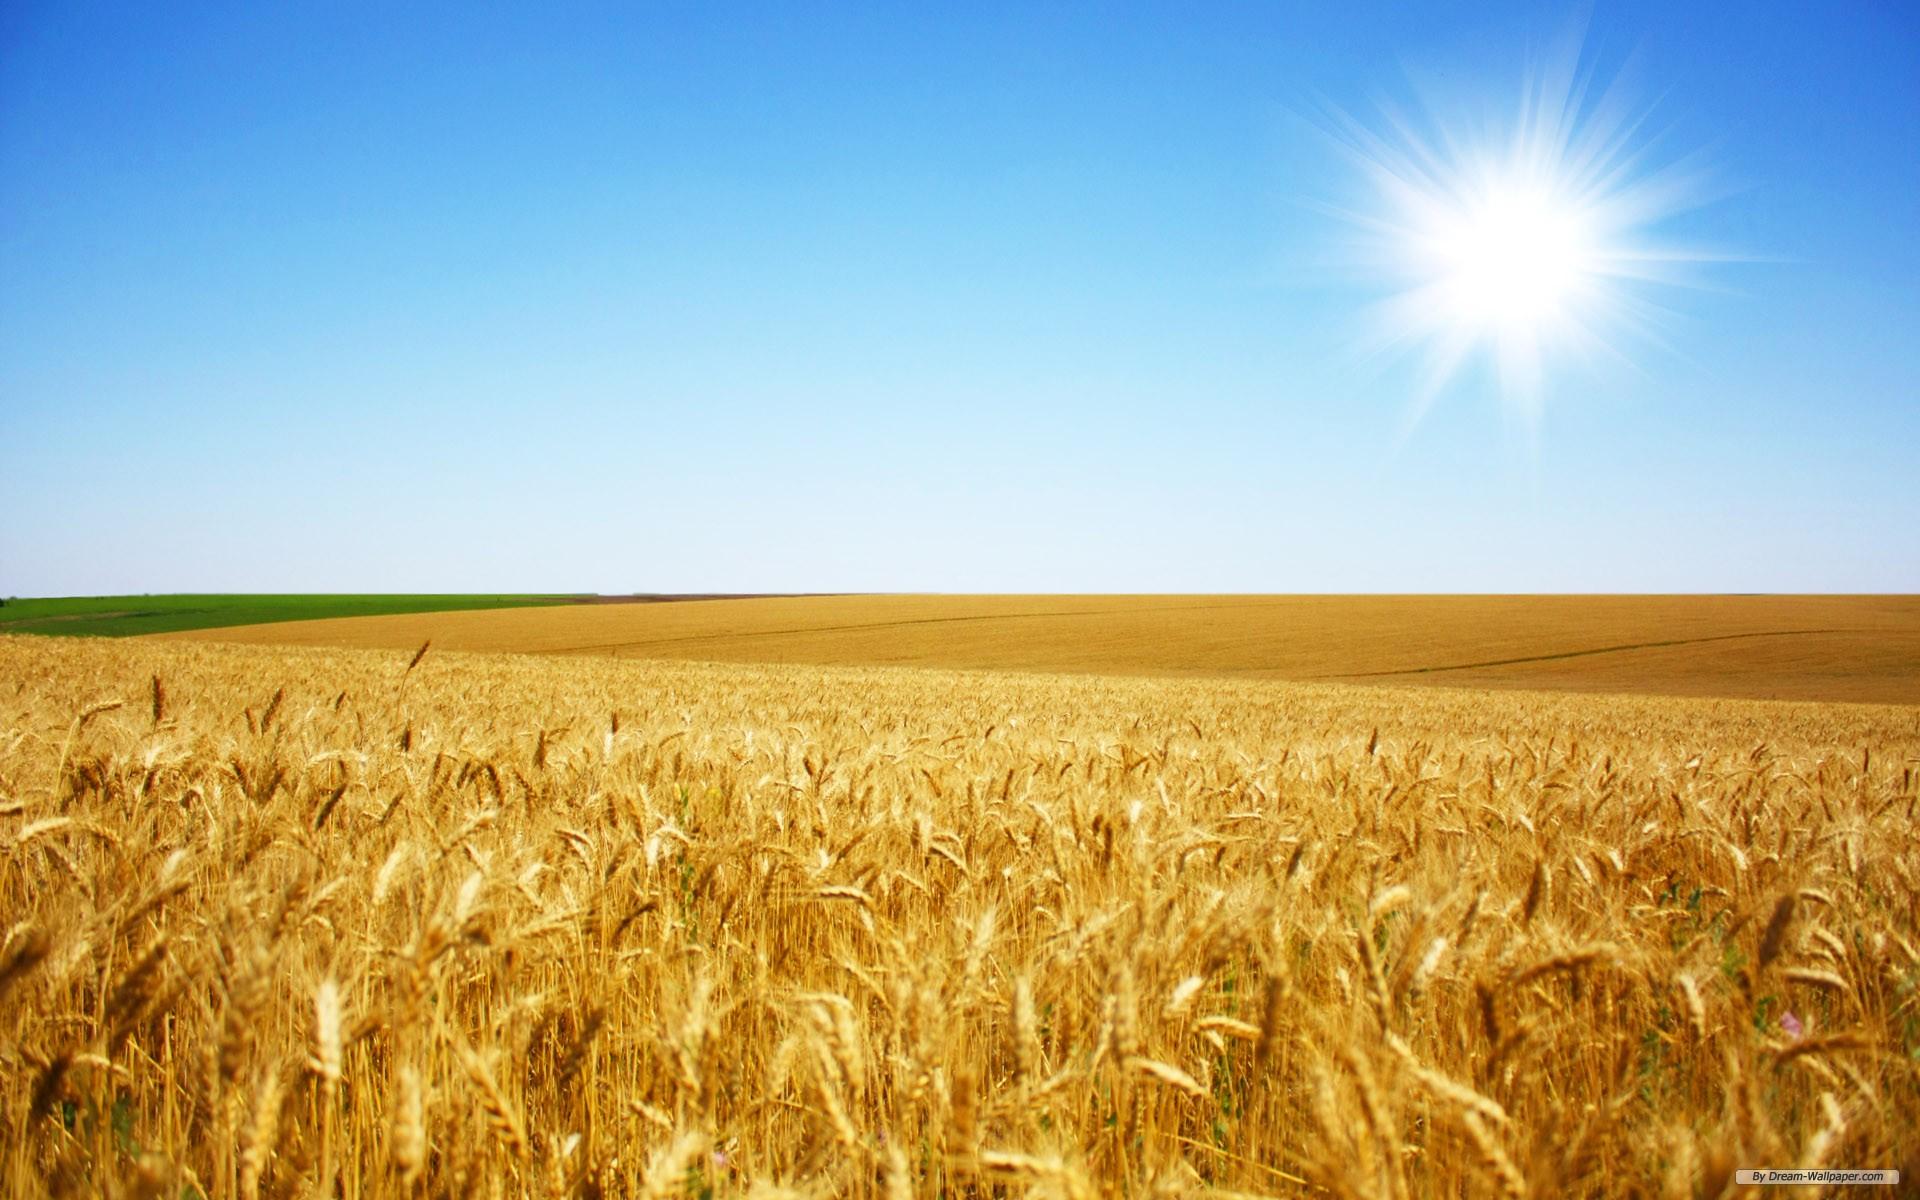 Free Nature wallpaper - Wheat Field 1 wallpaper - 1920x1200 wallpaper - Index 1